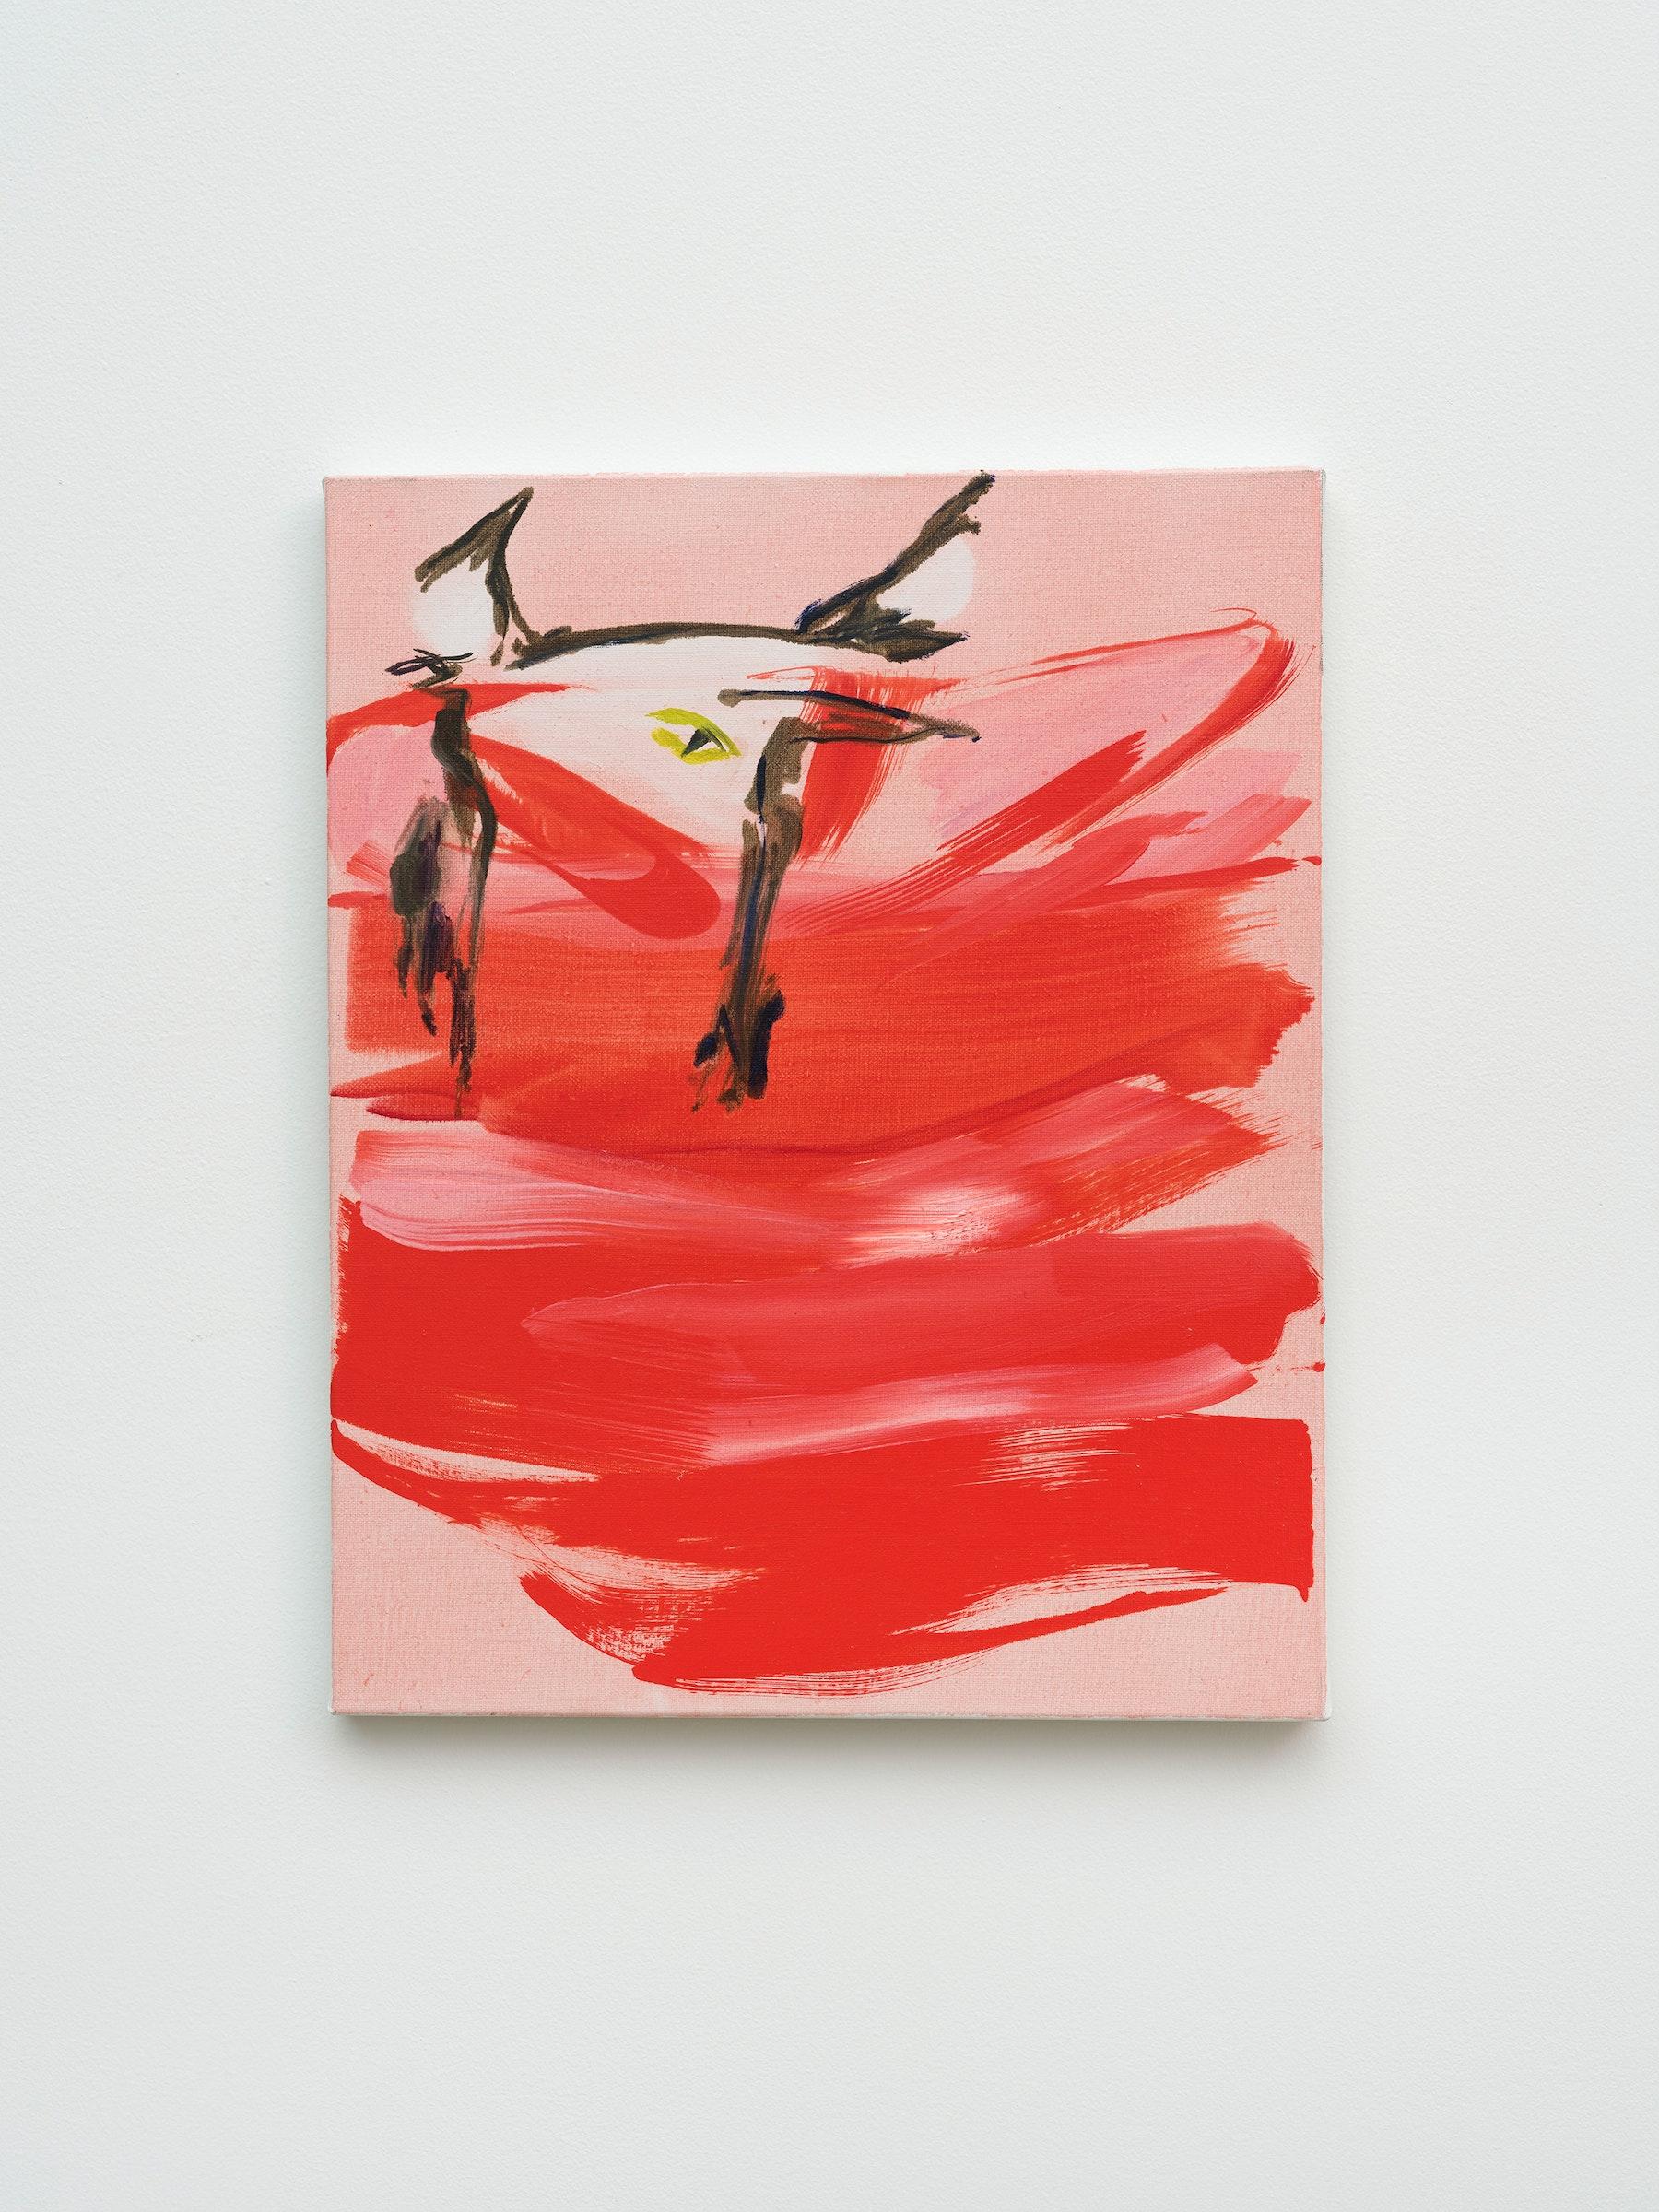 "Monique Van Genderen ""Ligne Roset Lou,"" 2019 Oil on linen 20"" x 16"" [HxW] (50.8 x 40.64 cm) Inventory #VGE413 Courtesy of the artist and Vielmetter Los Angeles Photo credit: Jeff McLane"